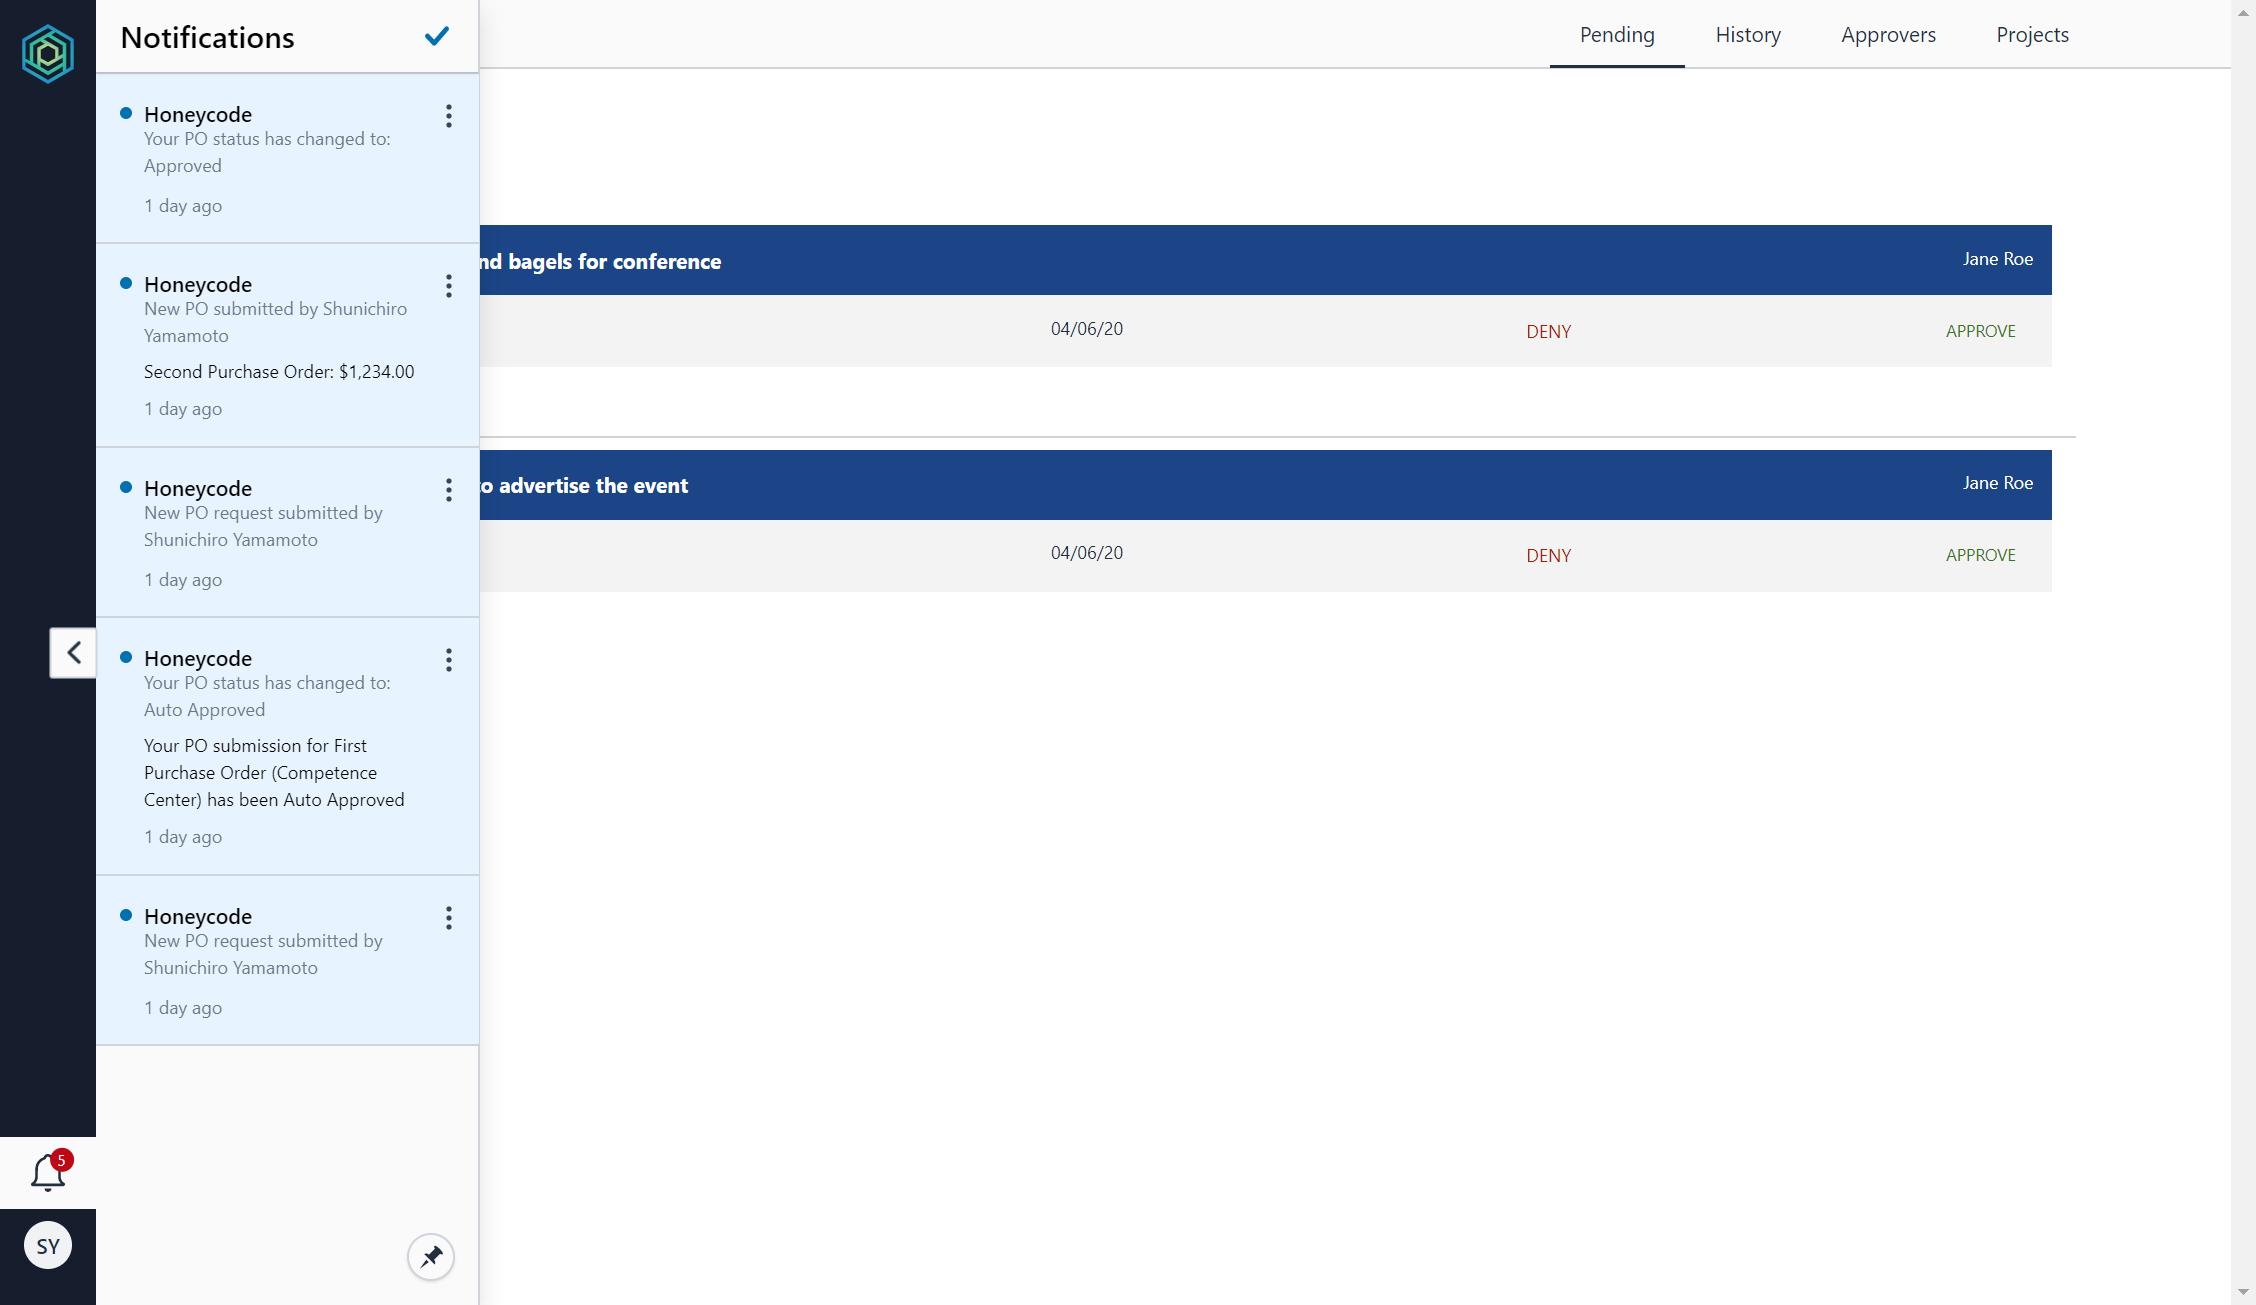 screenshot-app.honeycode.aws-2020.06.28-18_44_26.png